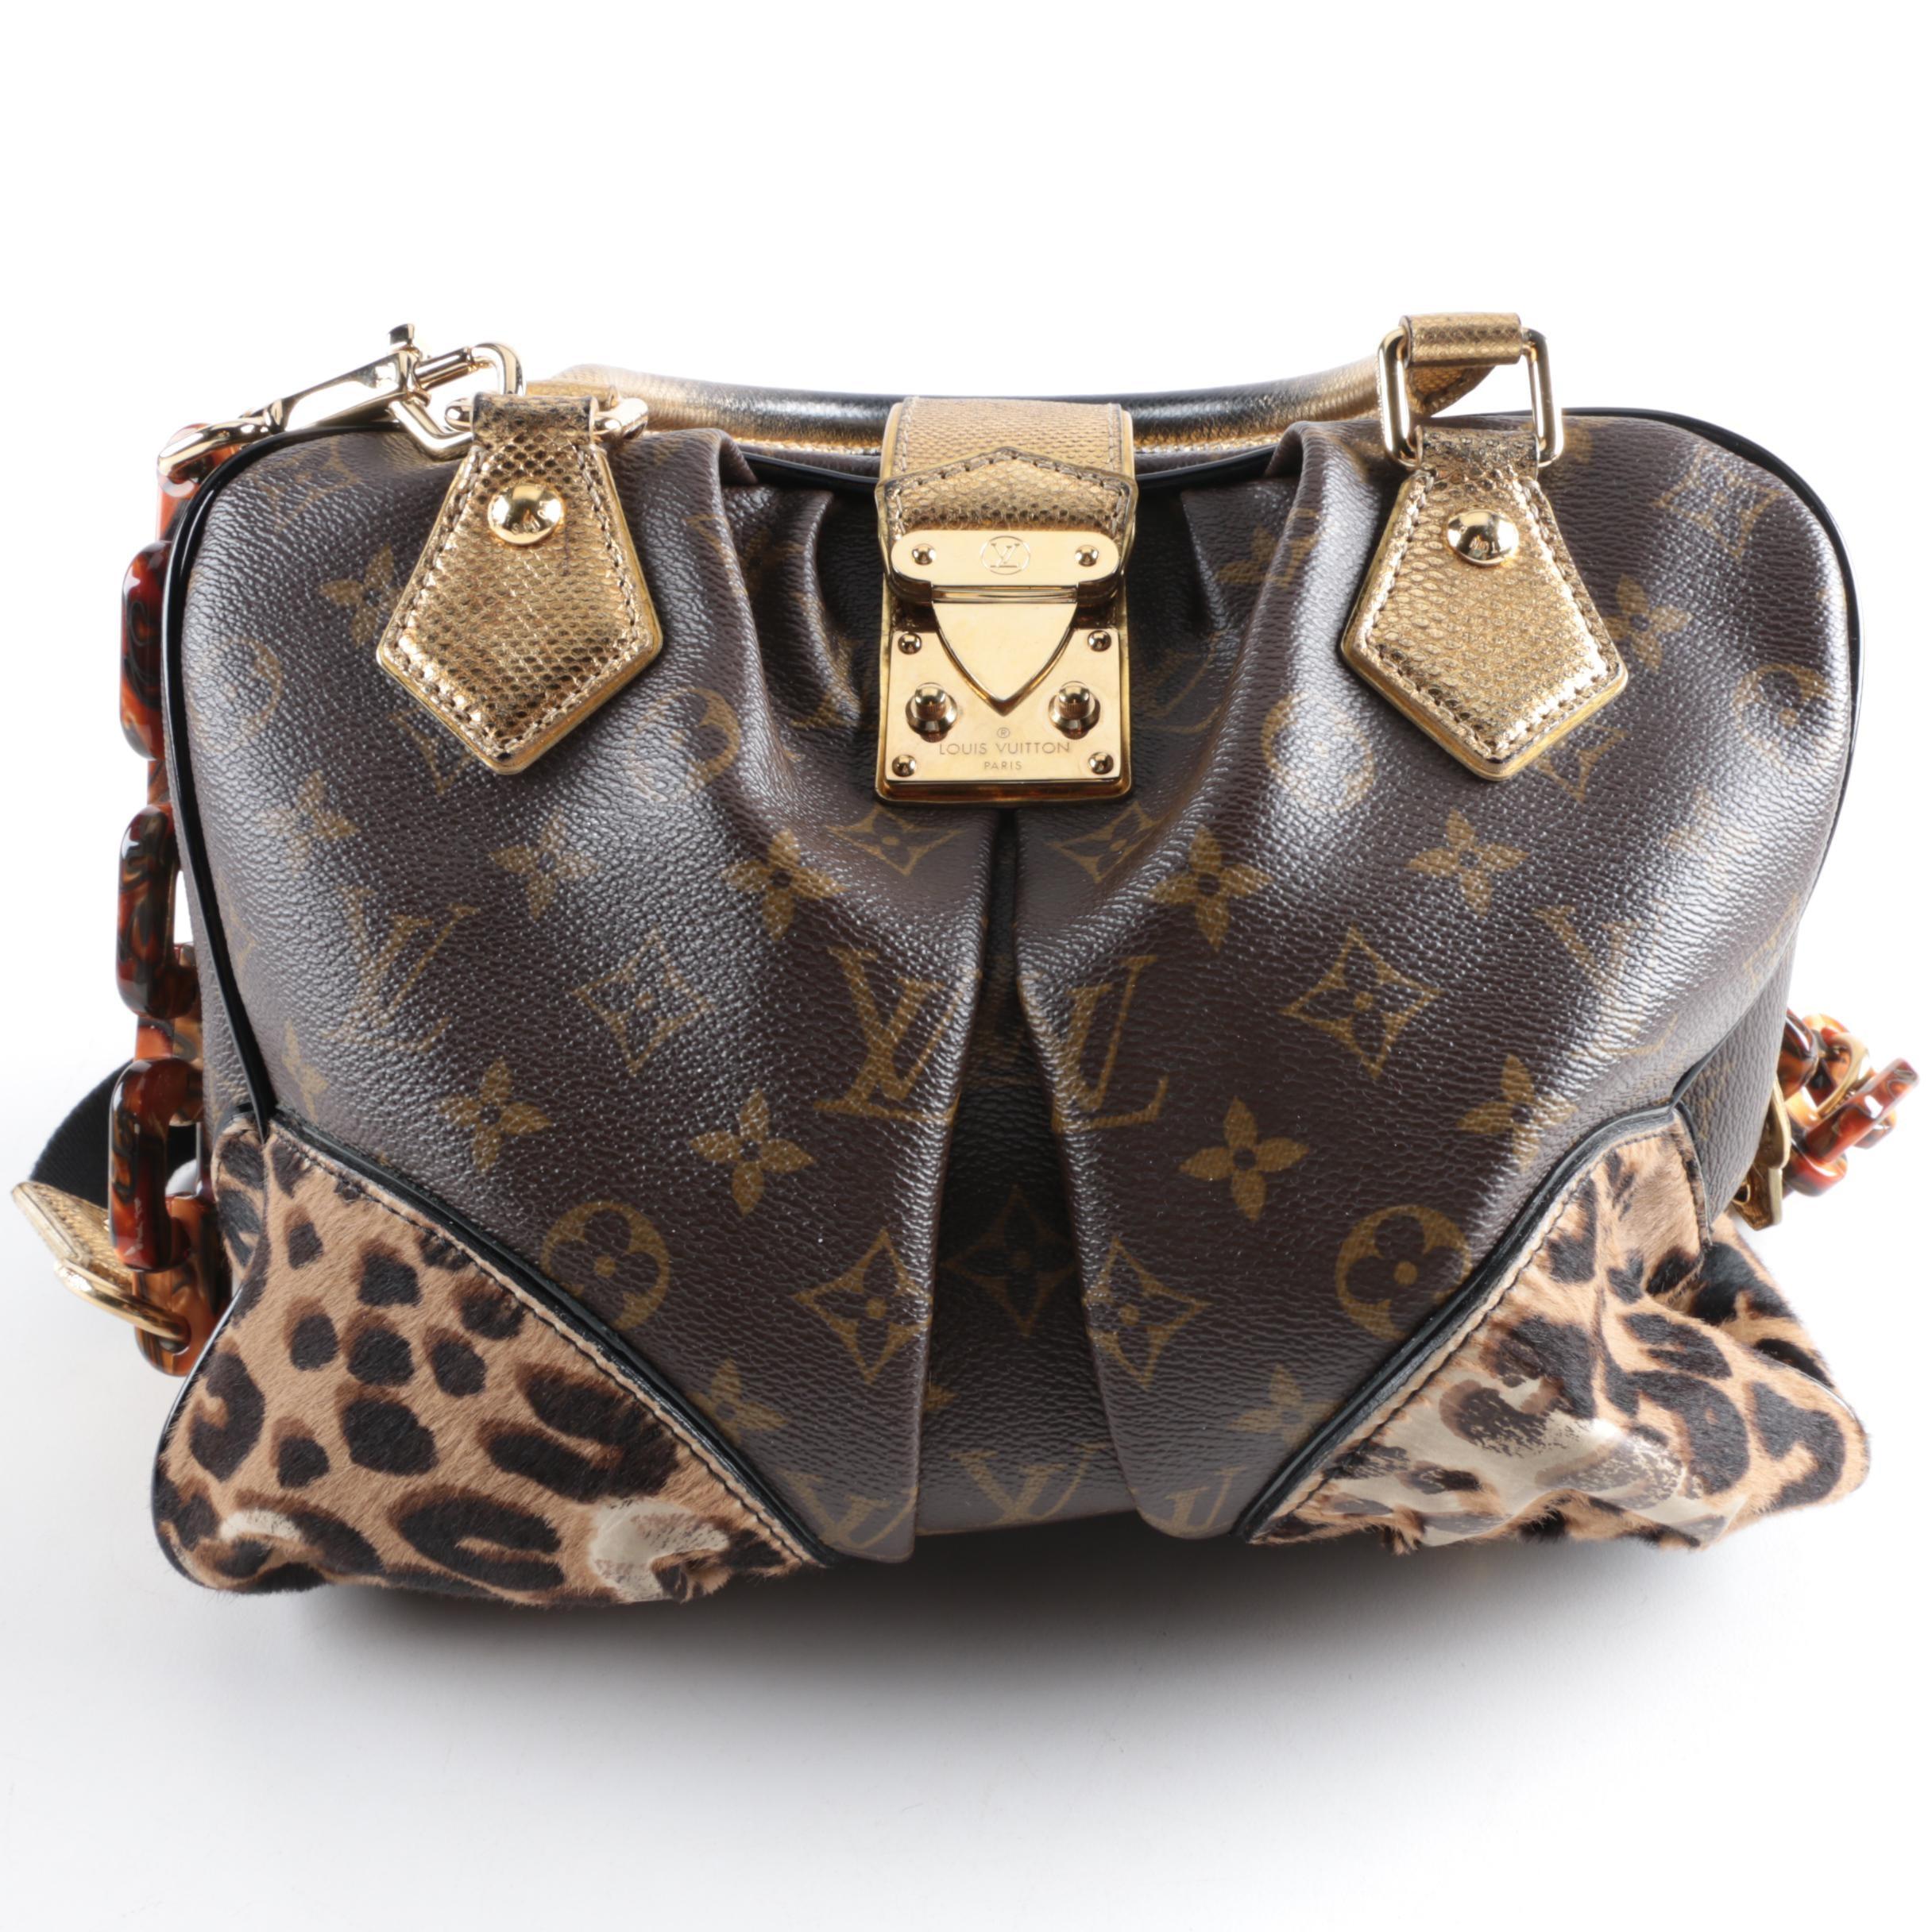 2006 Louis Vuitton Limited Edition Adele Handbag